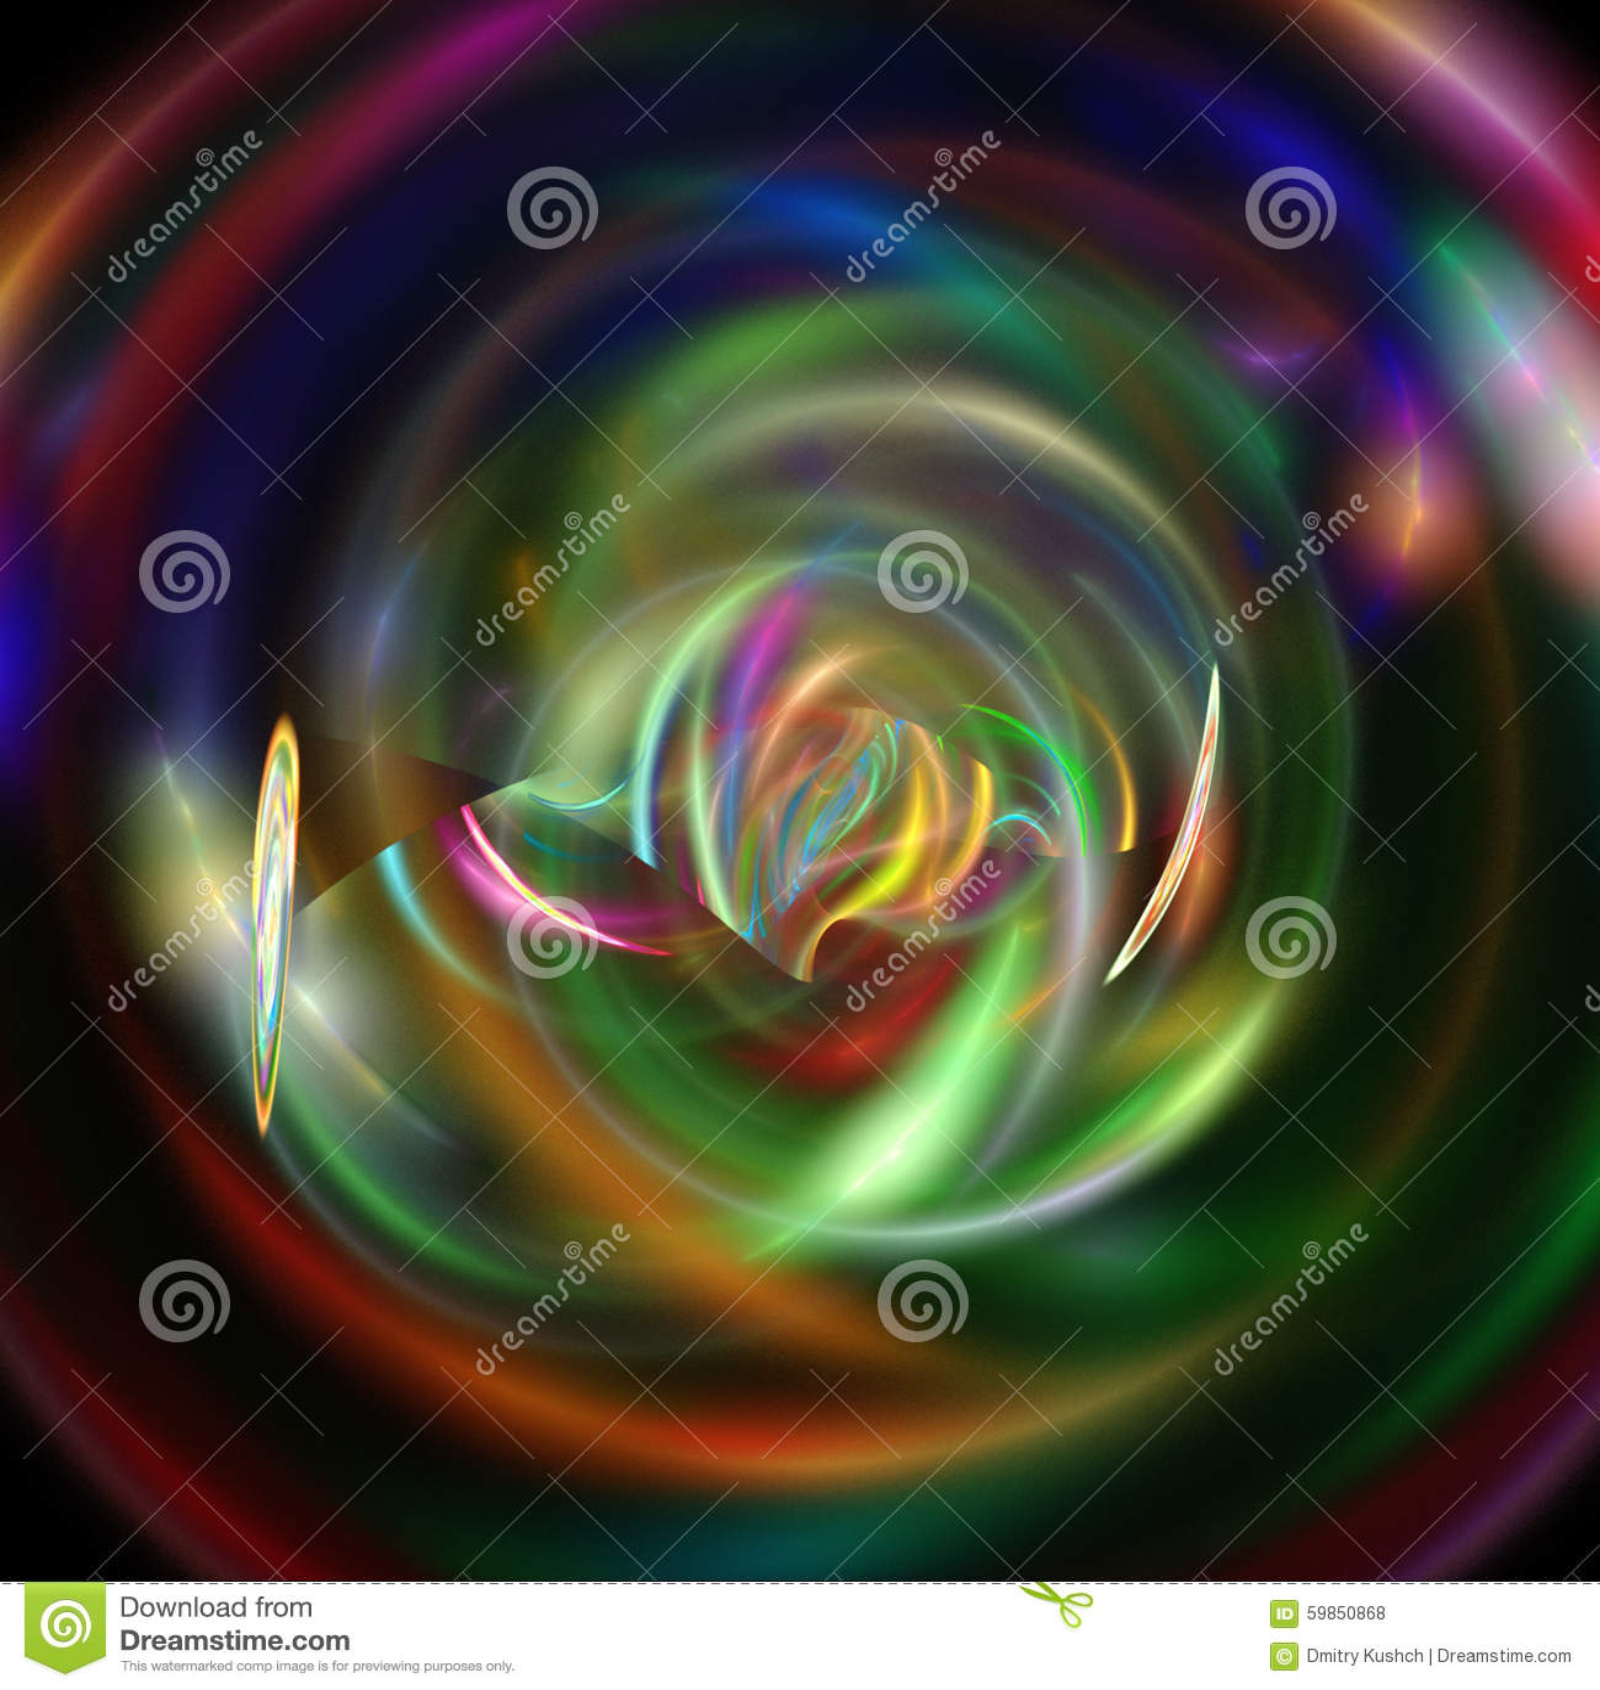 illustration fractal background clocks - photo #5